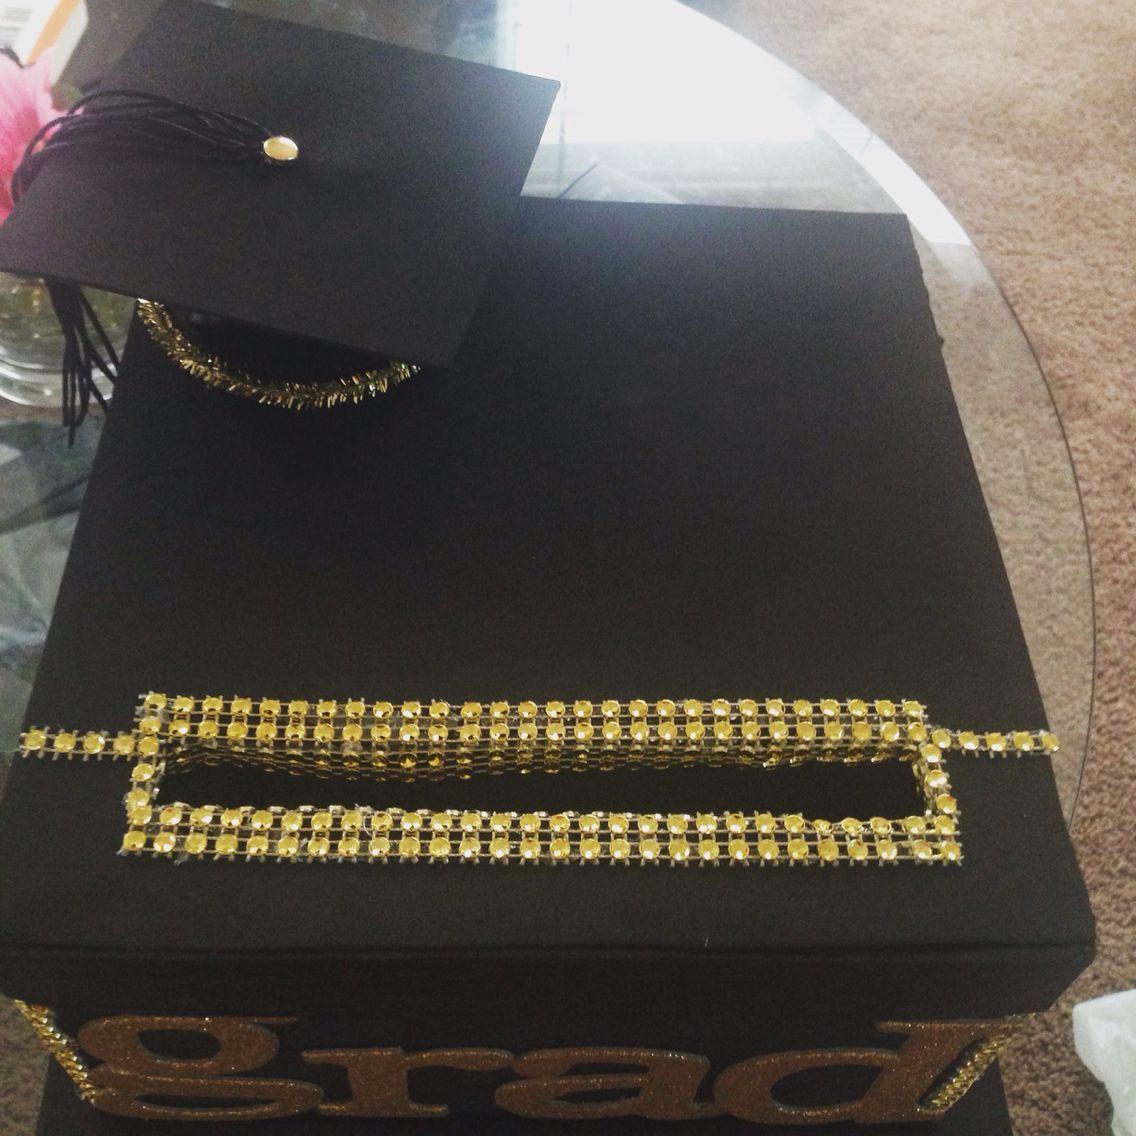 Diy graduaton card box black gold ght_e graduation